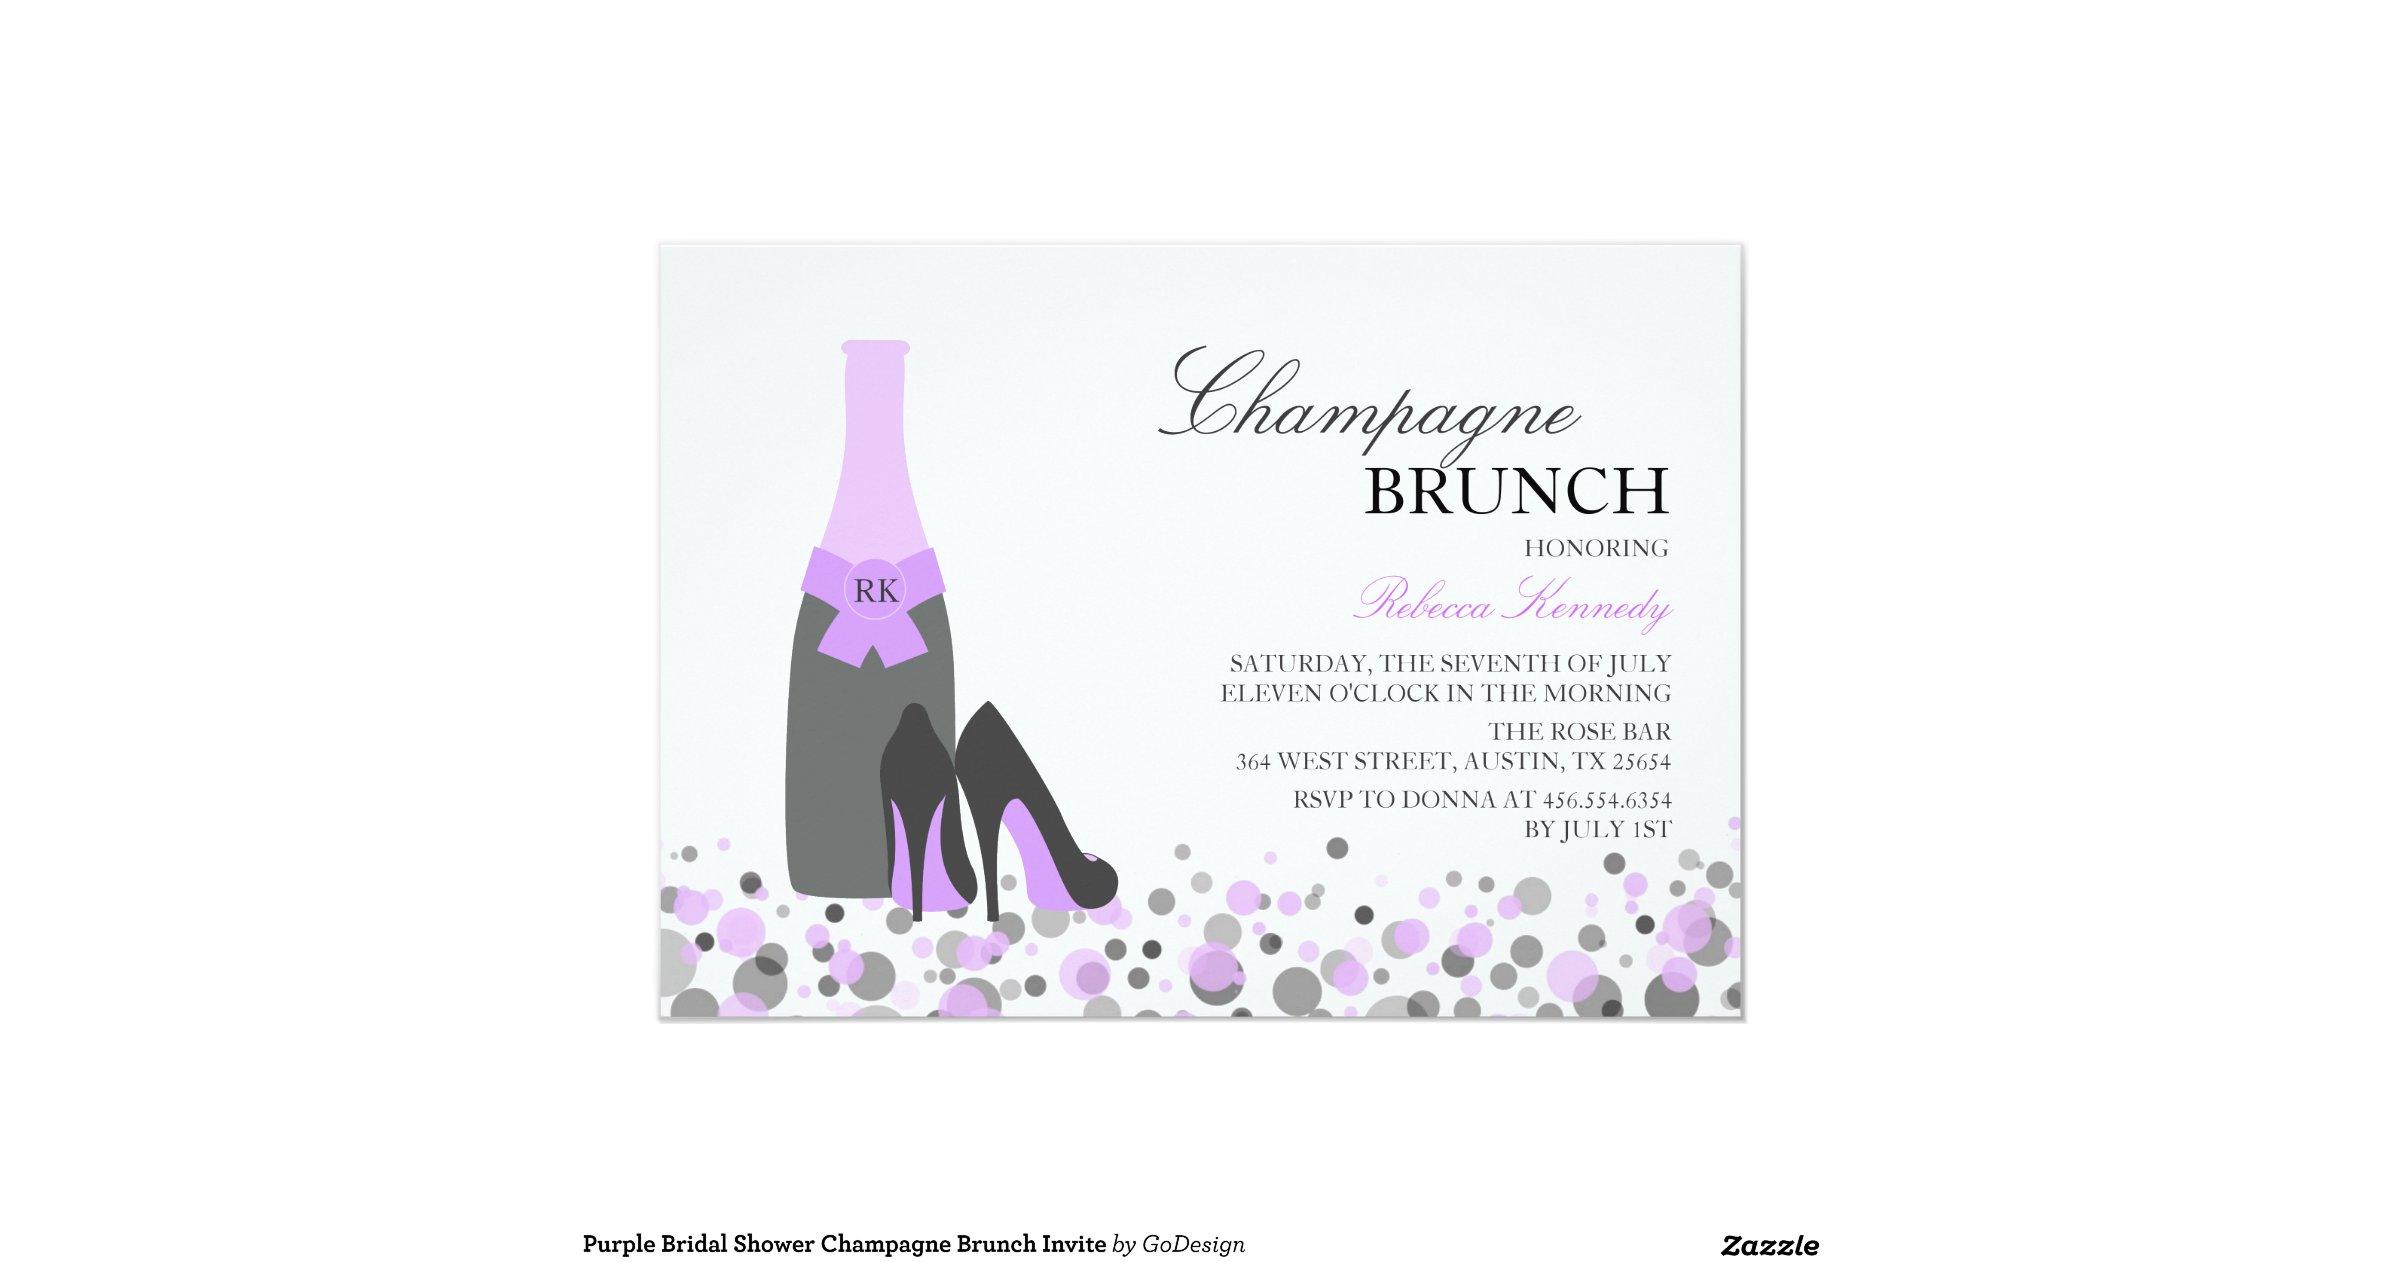 Purple bridal shower champagne brunch invite for Champagne brunch bridal shower